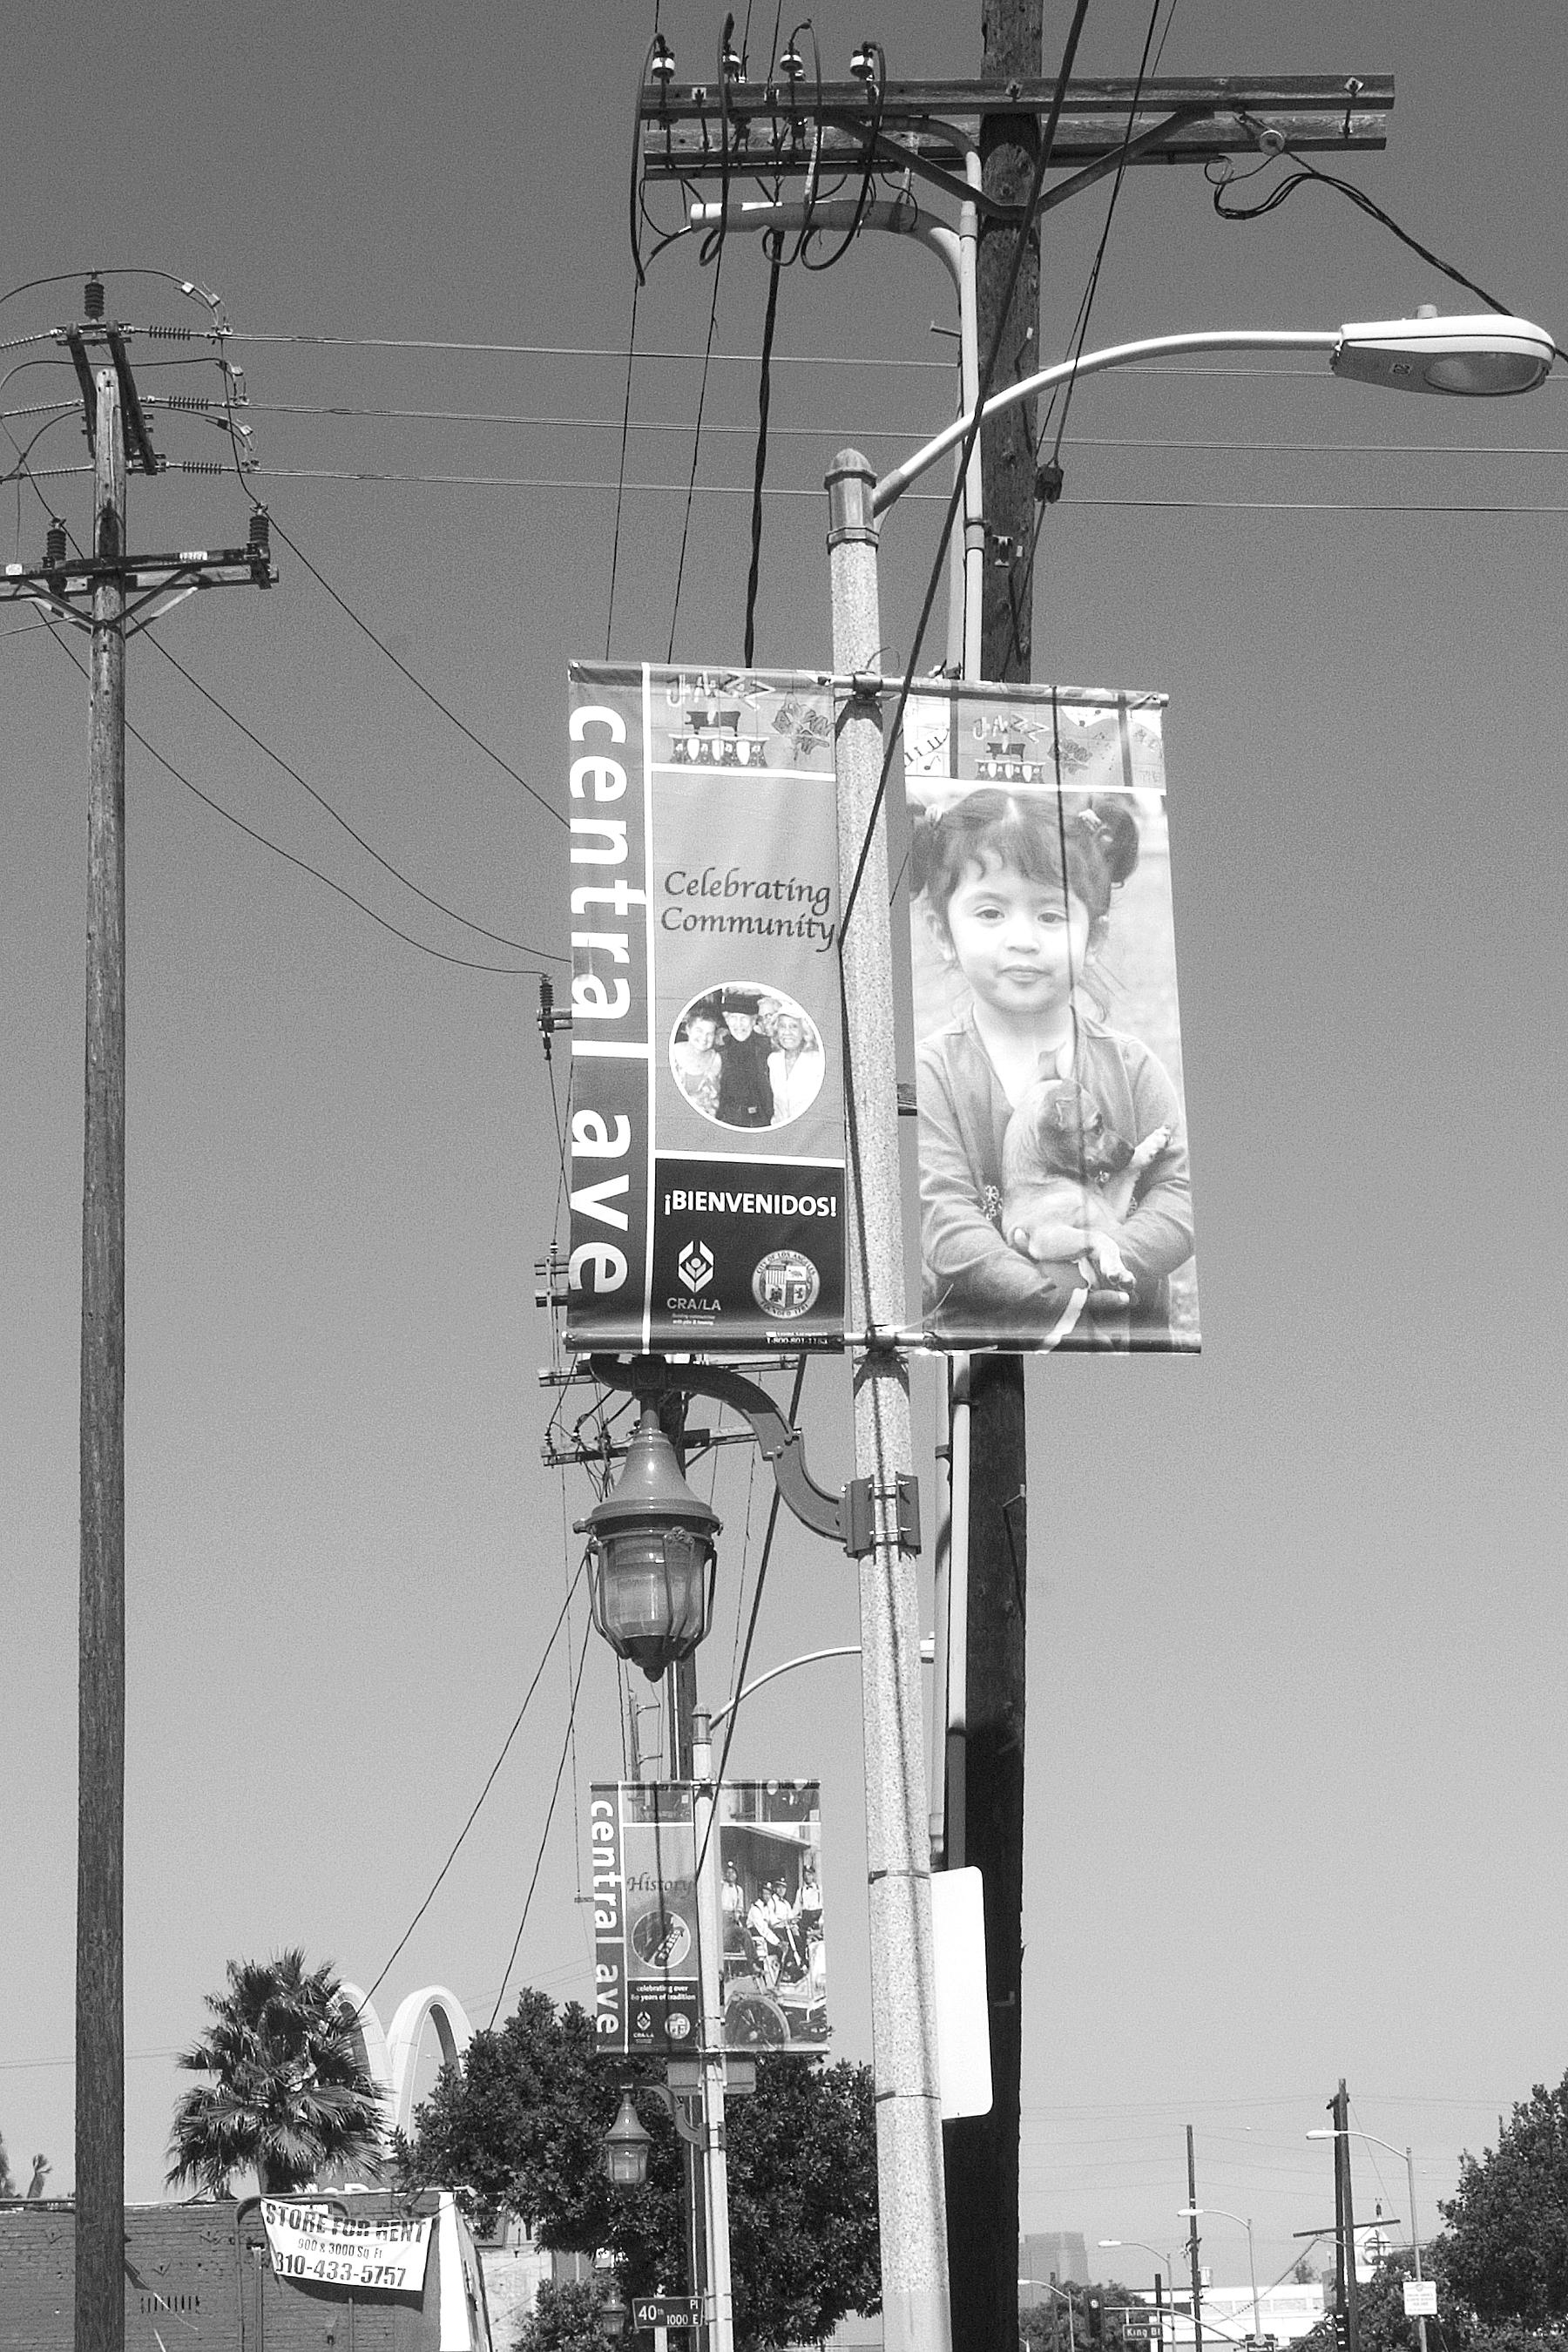 """Celebrating Community"" banner, Central Avenue, South Los Angeles. 2007.                                0     false             18 pt     18 pt     0     0         false     false     false                                                     /* Style Definitions */ table.MsoNormalTable {mso-style-name:""Table Normal""; mso-tstyle-rowband-size:0; mso-tstyle-colband-size:0; mso-style-noshow:yes; mso-style-parent:""""; mso-padding-alt:0in 5.4pt 0in 5.4pt; mso-para-margin:0in; mso-para-margin-bottom:.0001pt; mso-pagination:widow-orphan; font-size:10.0pt; font-family:""Times New Roman"";}"